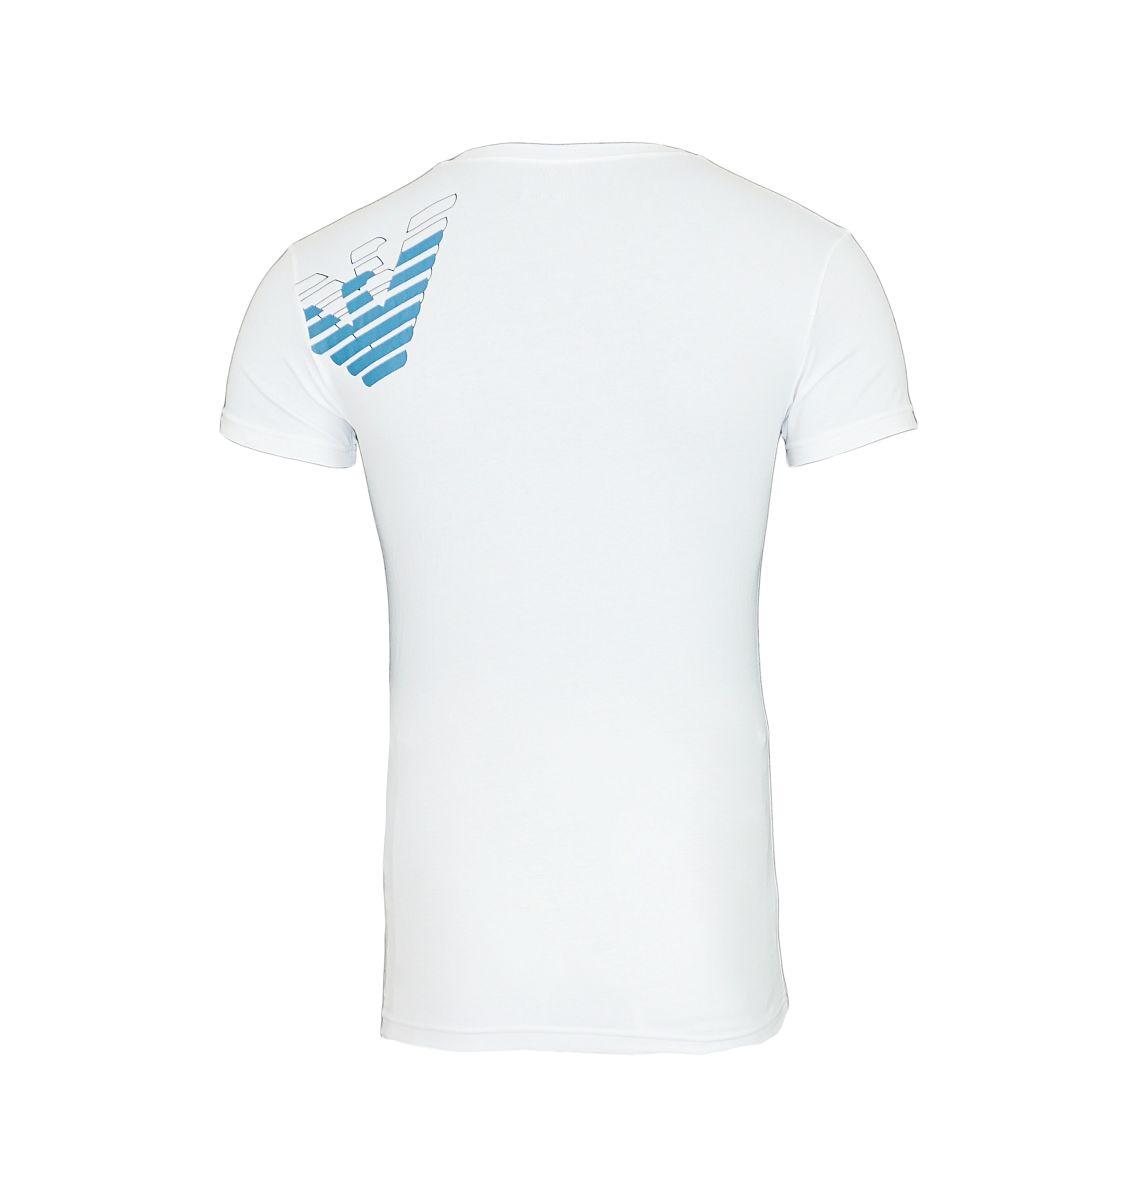 Emporio Armani T-Shirt Shirt V-Ausschnitt 110810 7A725 00010 BIANCO HW17-EATS1